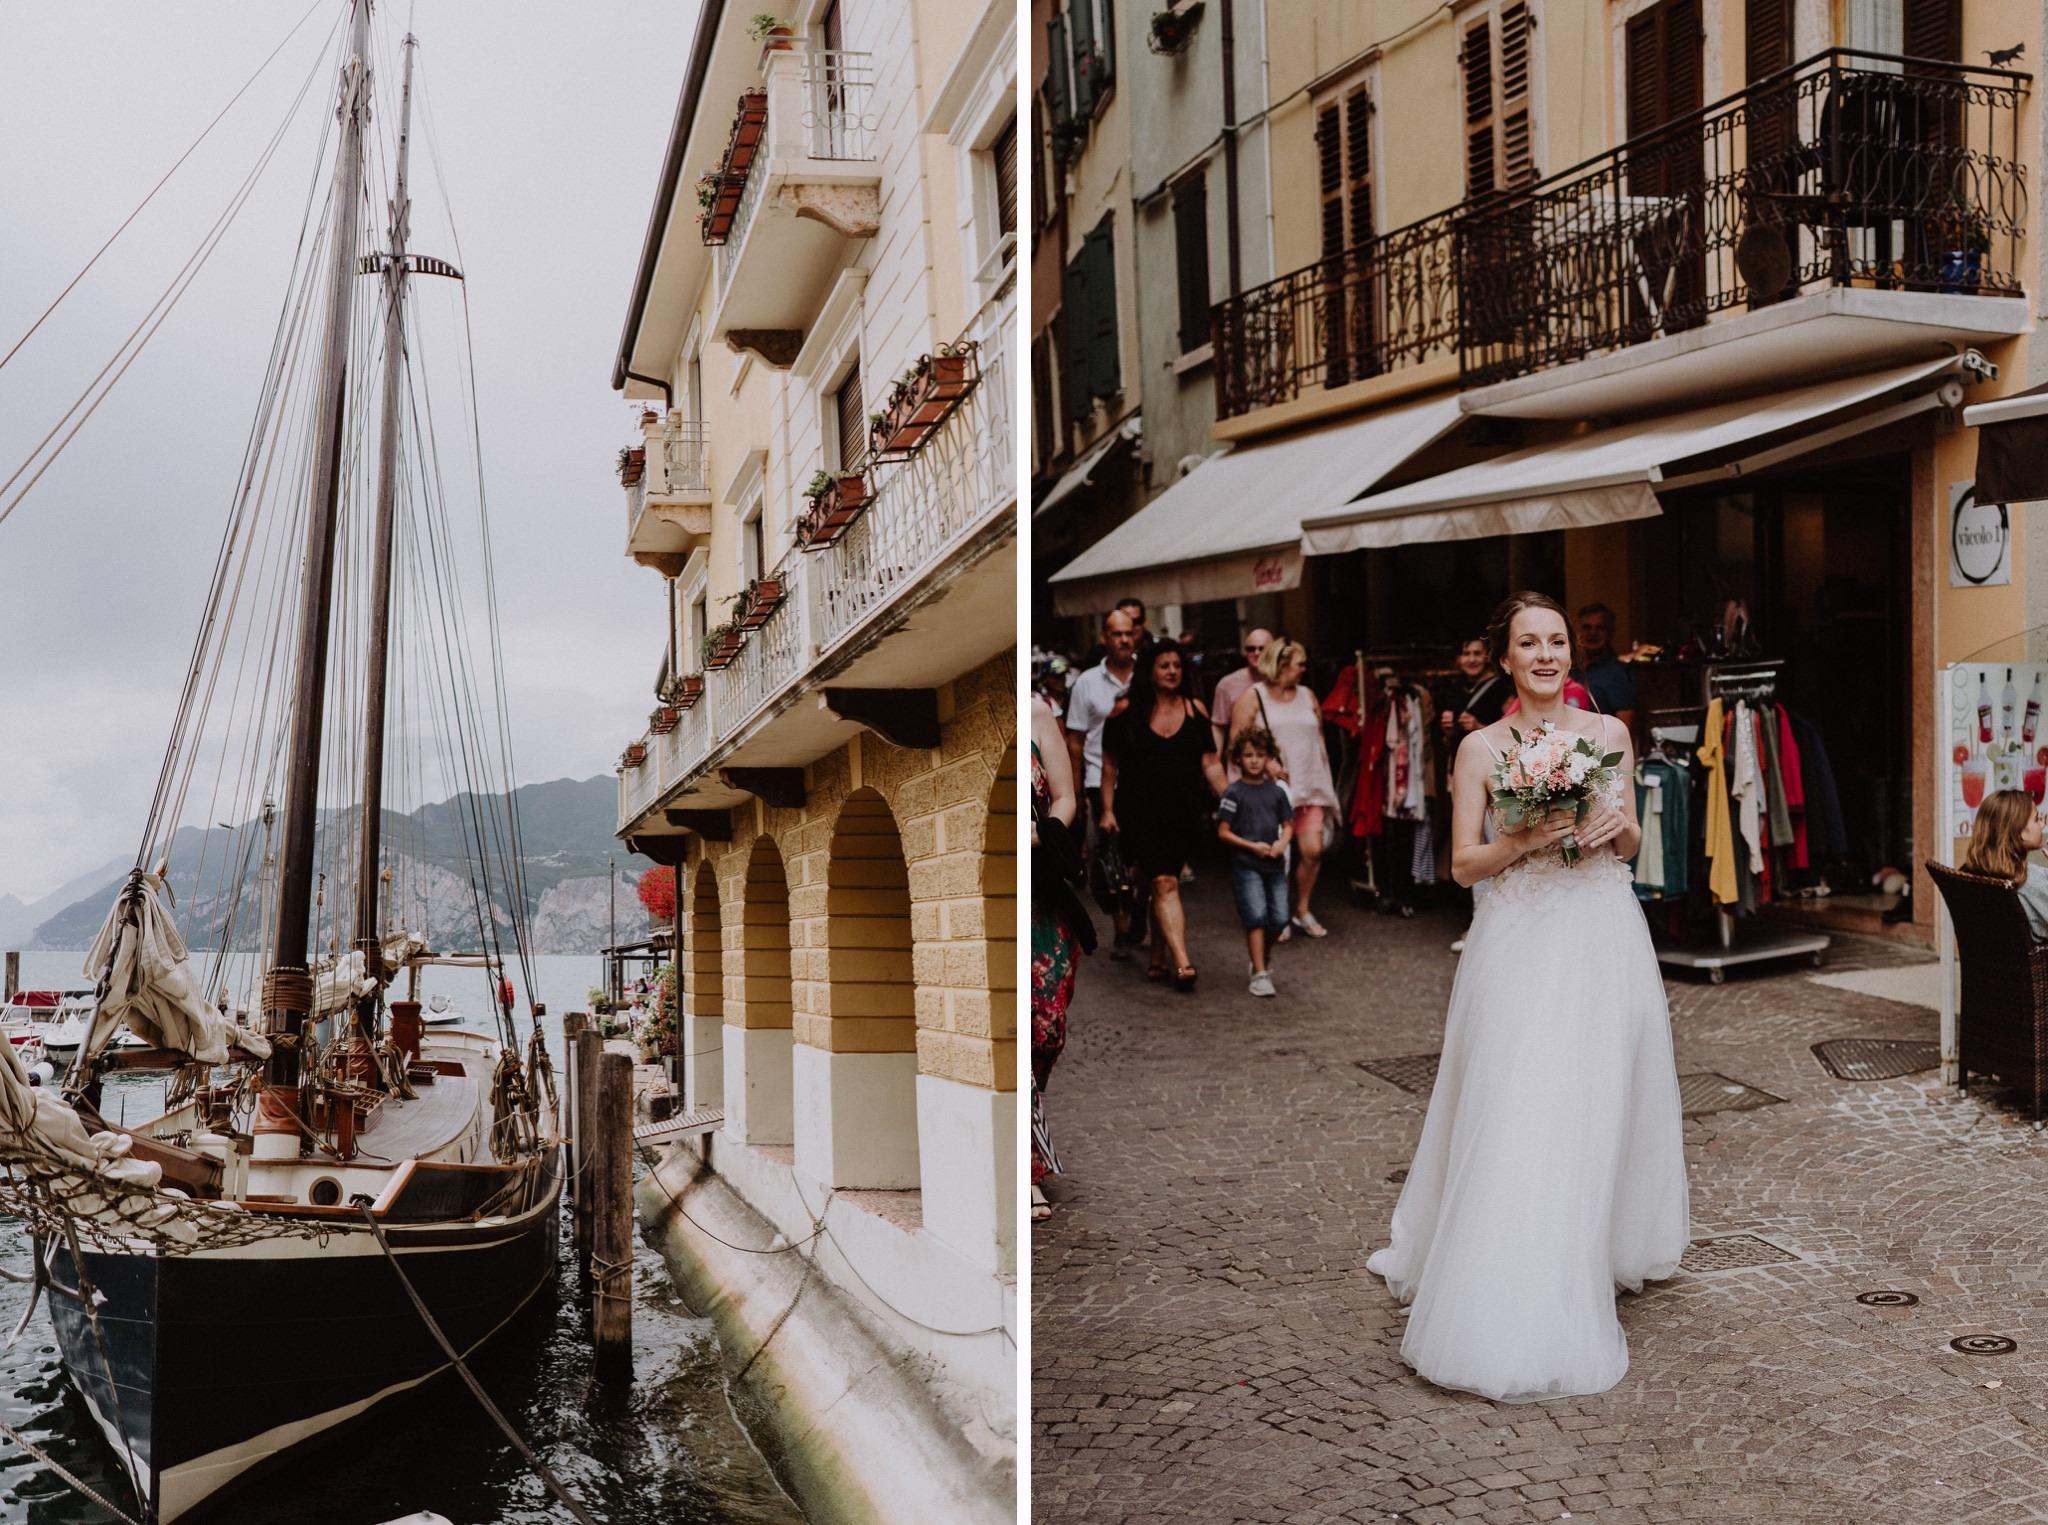 19 la 02 bootsfahrt 1001 la 02 bootsfahrt 1019 weddinphotographer Hochzeitsfotograf hamilton Stuttgart Weddingphotography newzealand